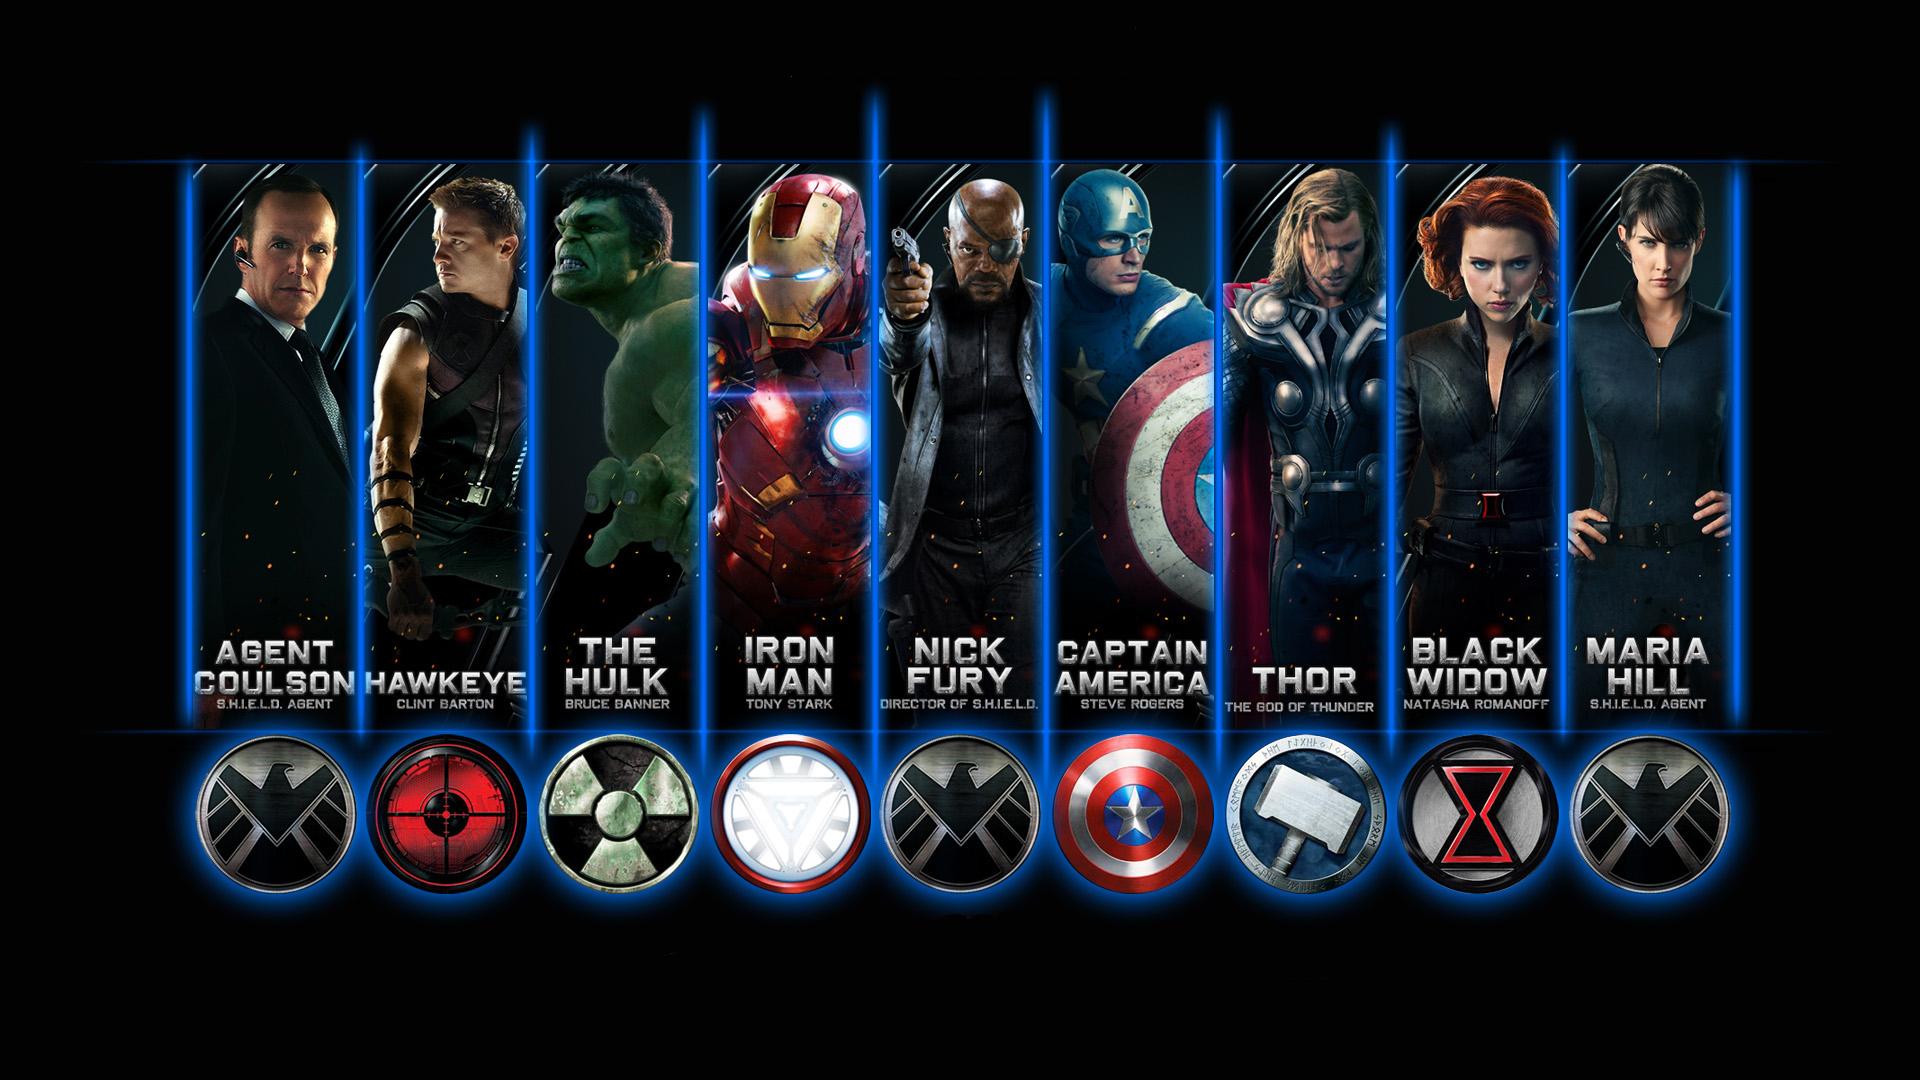 High Resolution Wallpaper | The Avengers 1920x1080 px